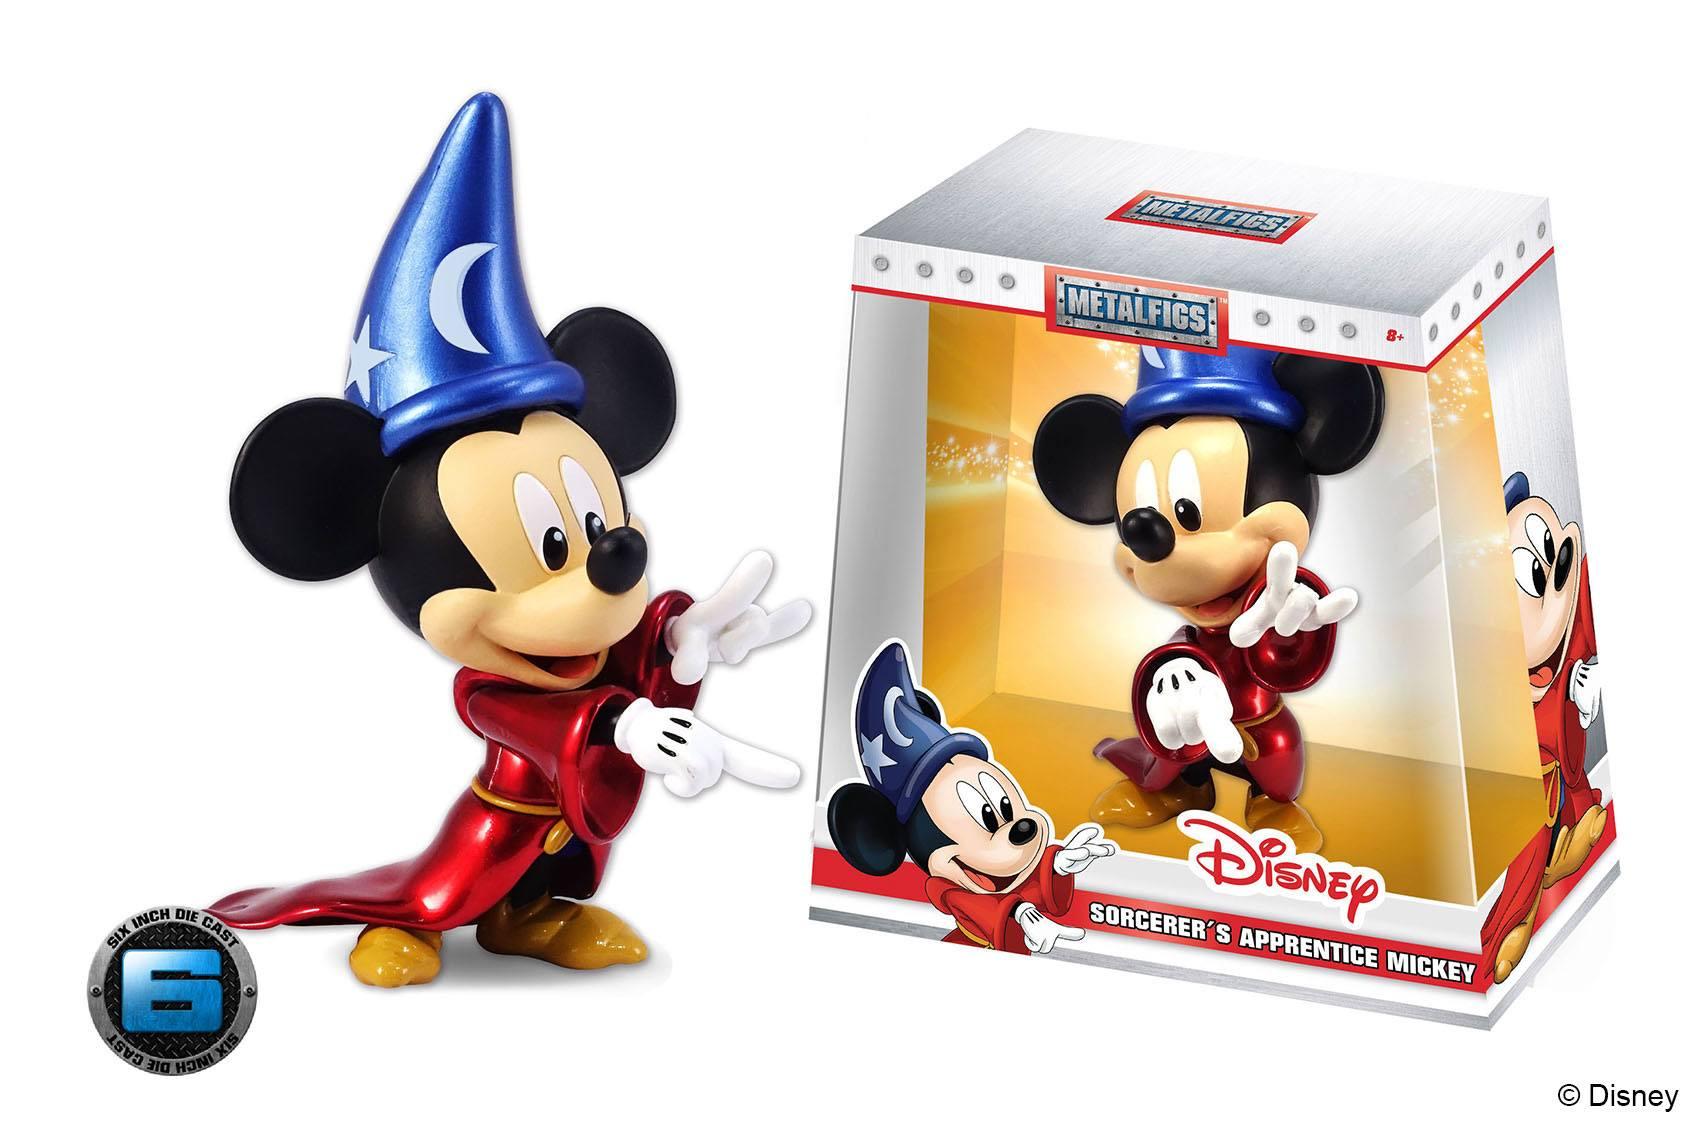 Disney Metalfigs Diecast Mini Figure Sorcerer's Apprentice Mickey 15 cm